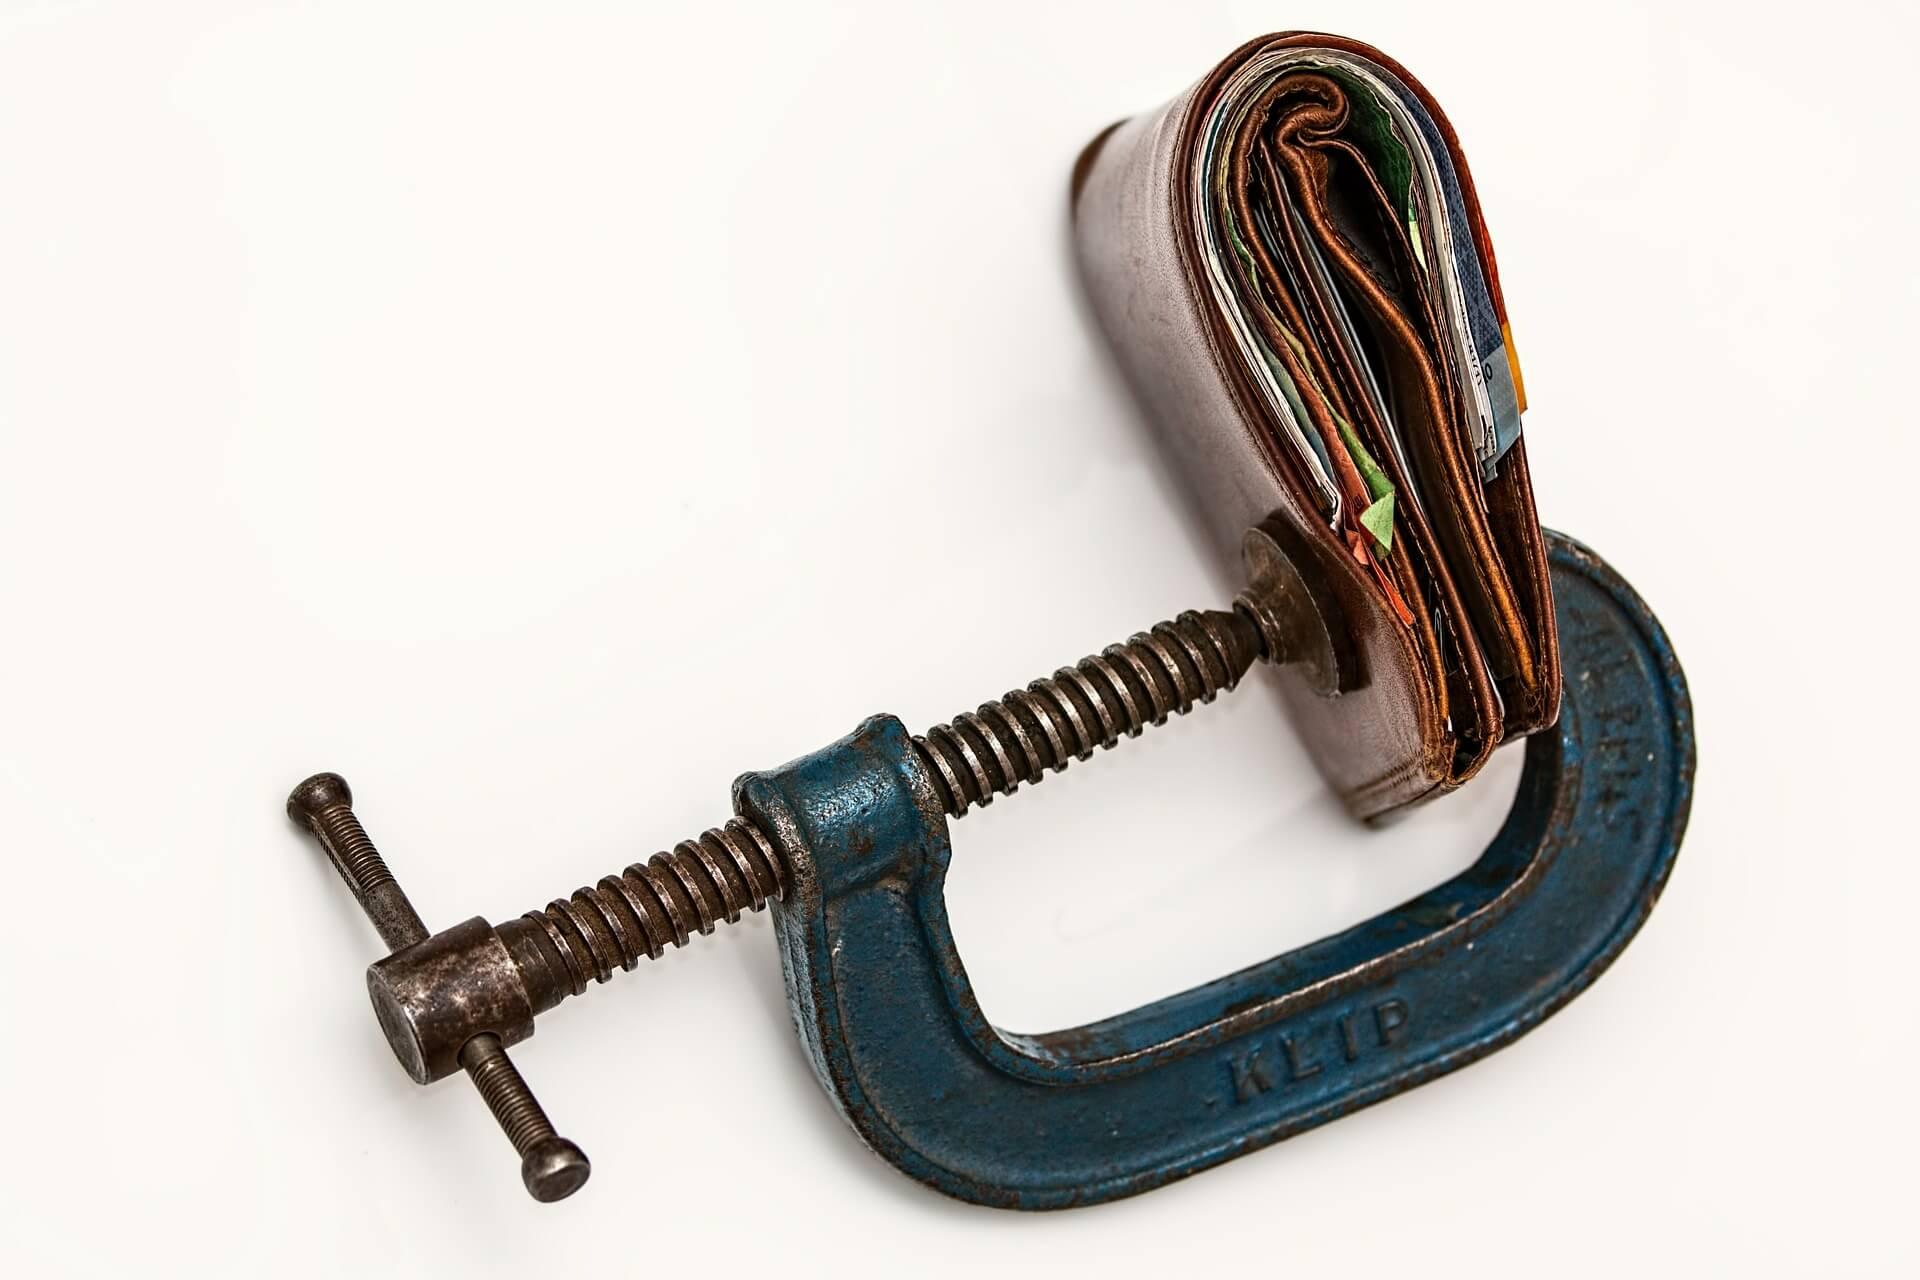 Wallet in clamp. Public domain: http://pixabay.com/en/purse-money-credit-squeeze-wallet-522622/